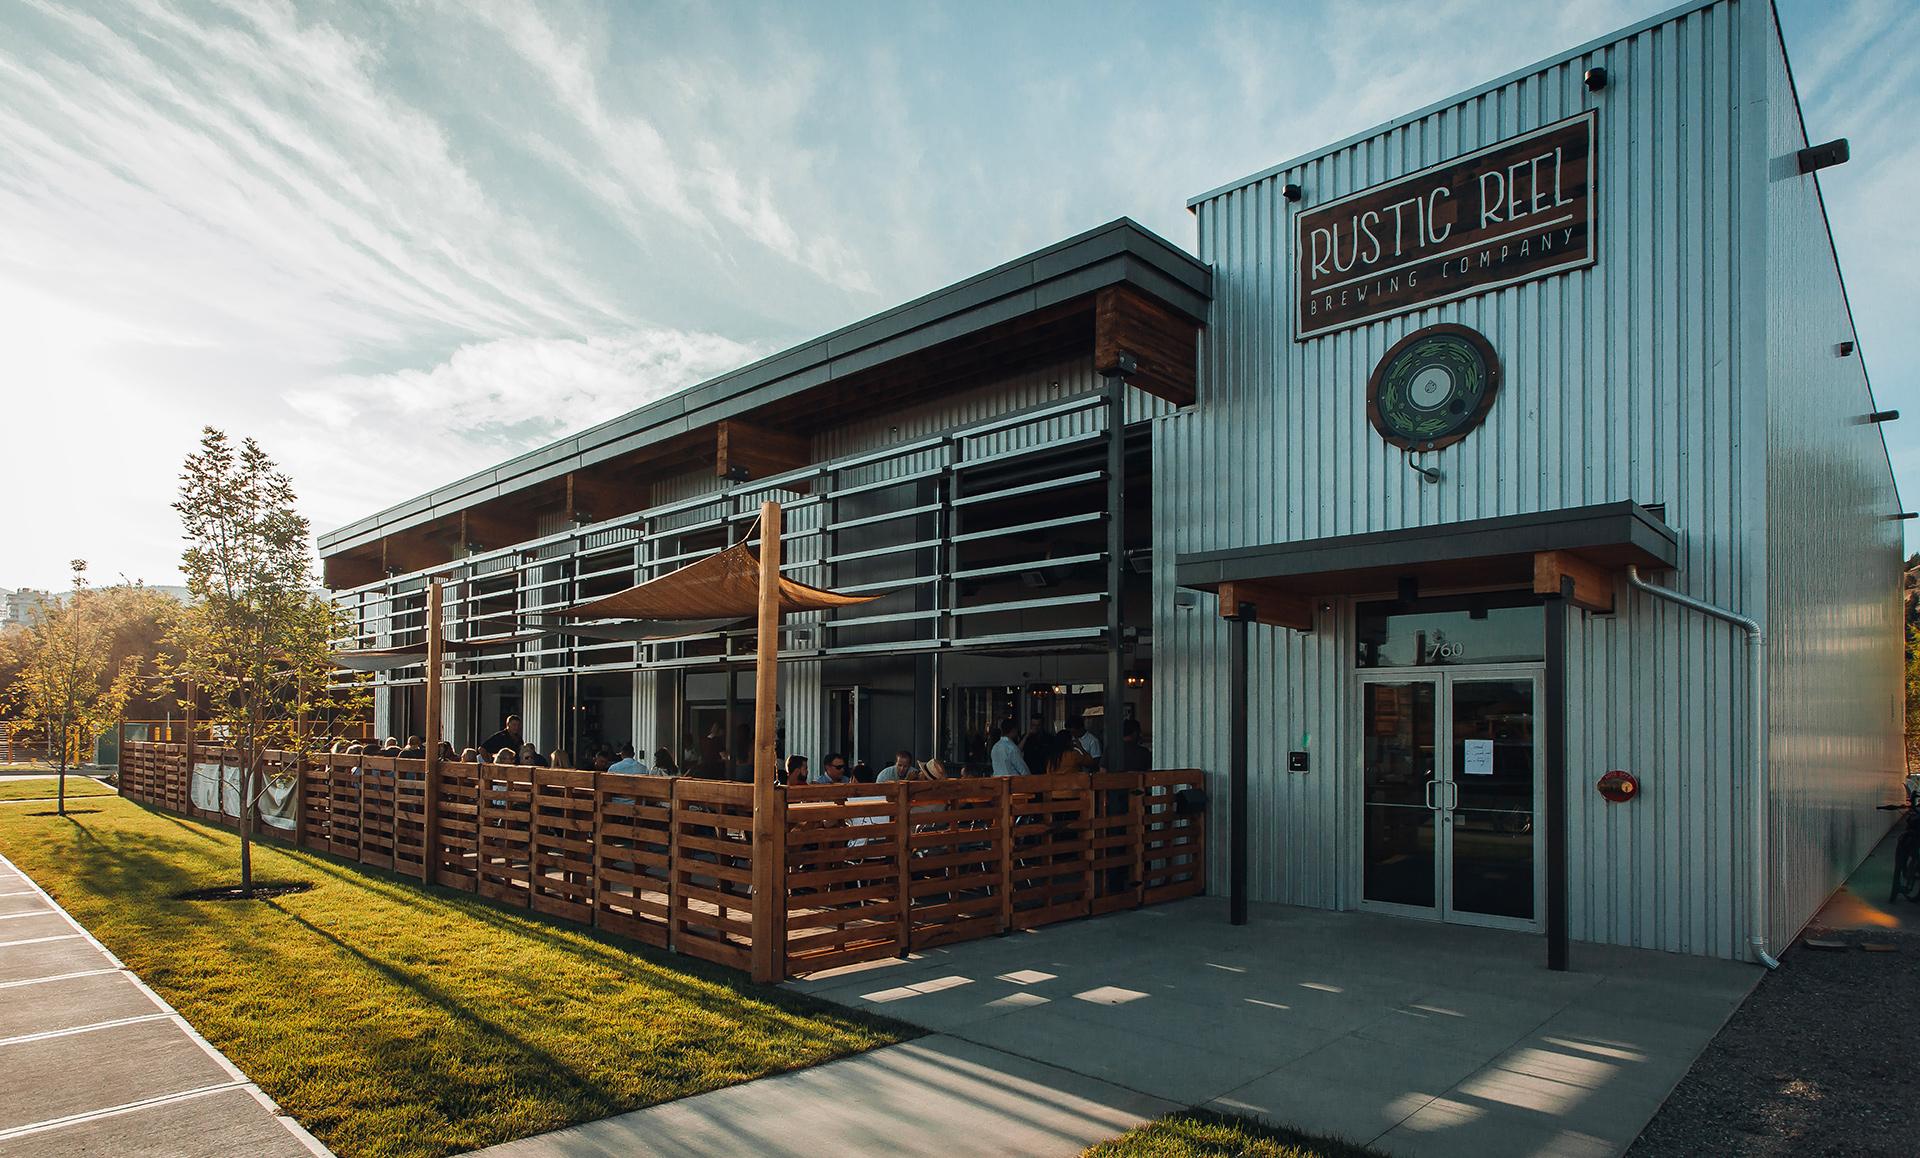 kelowna brewery marketing rustic reel exterior shot